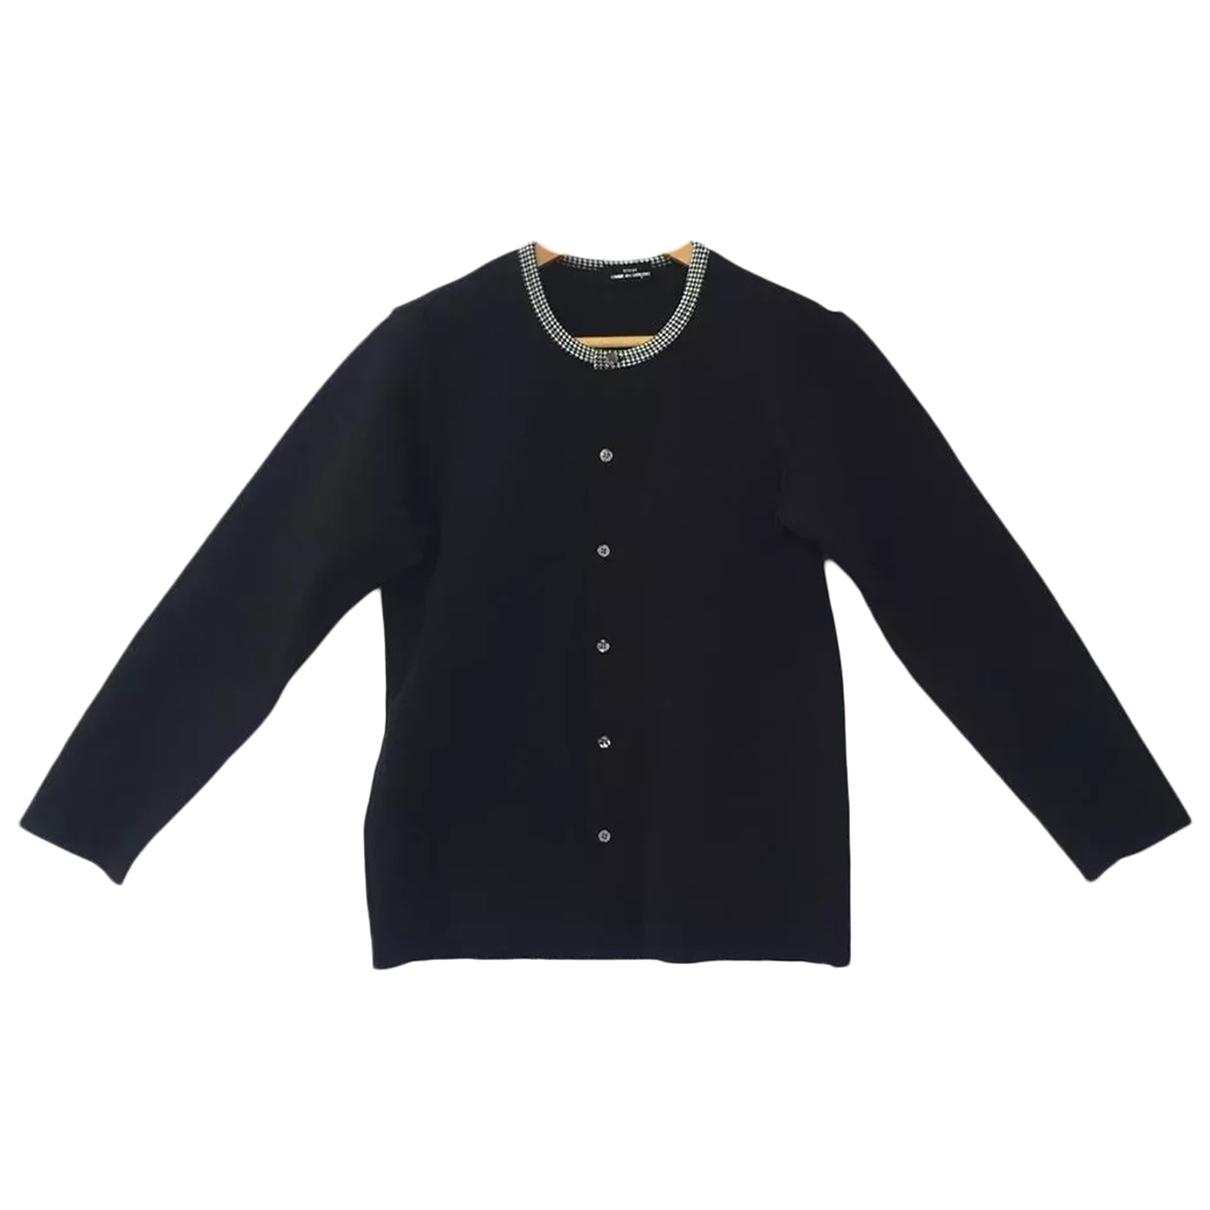 Comme Des Garcons \N Black Cotton Knitwear for Women M International